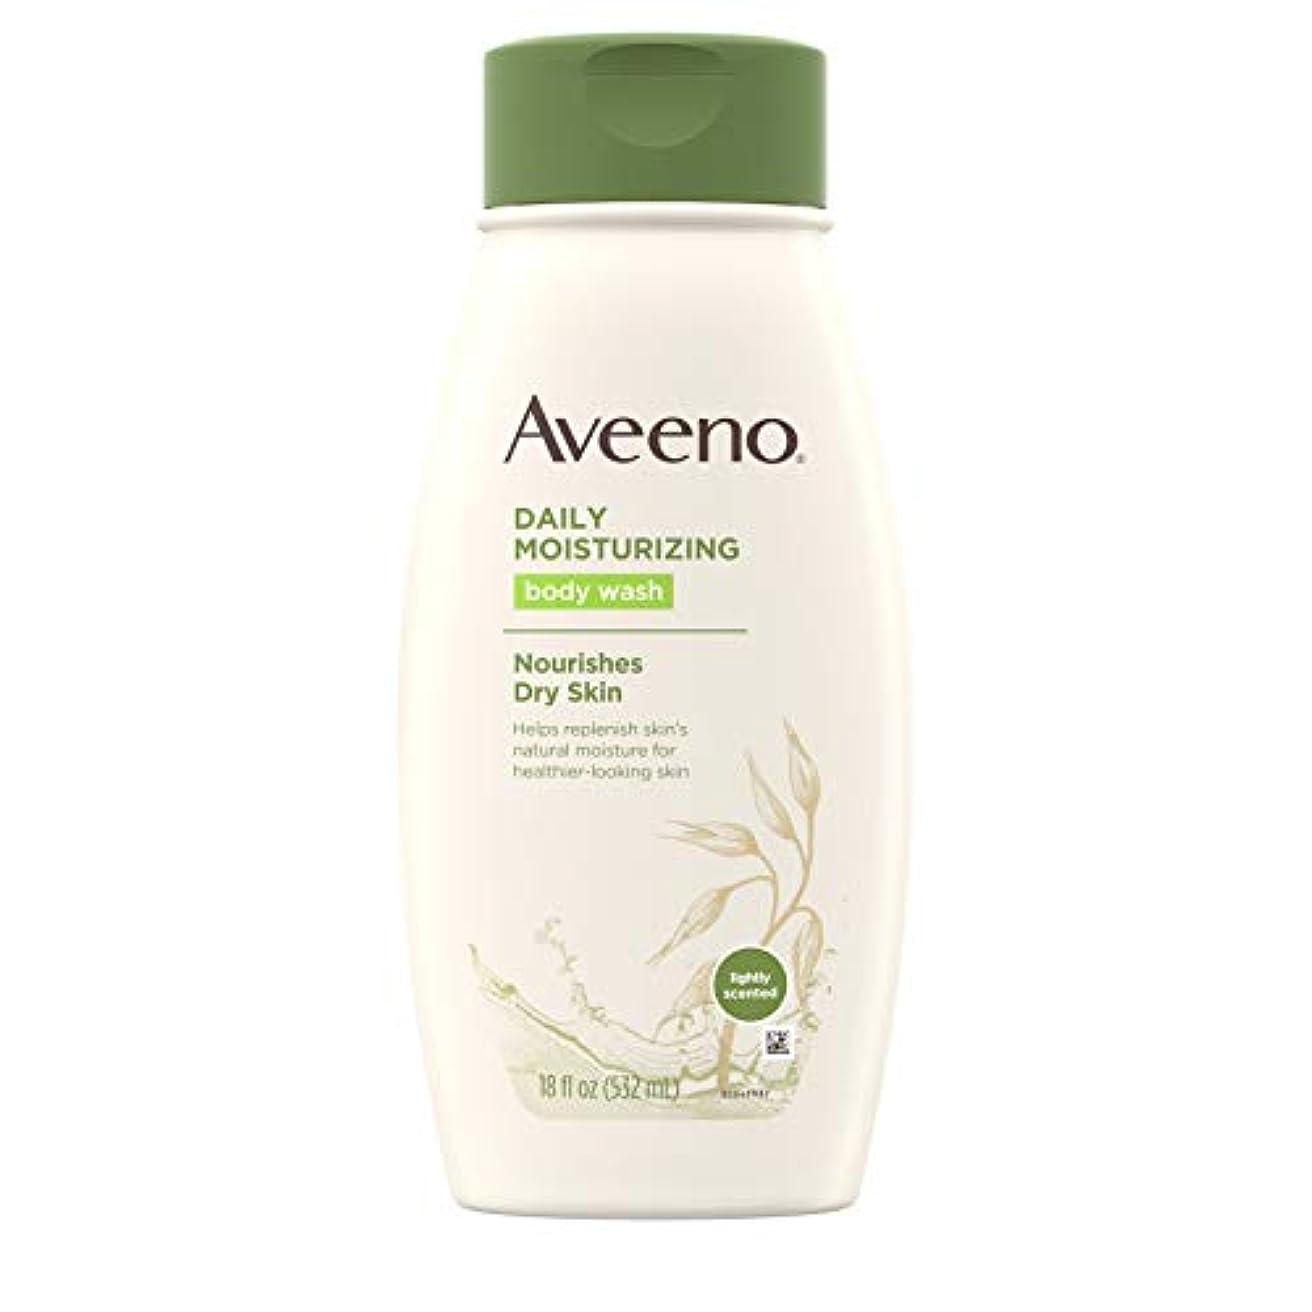 Aveeno Daily Moisturizing Body Wash - 18 Oz by Aveeno